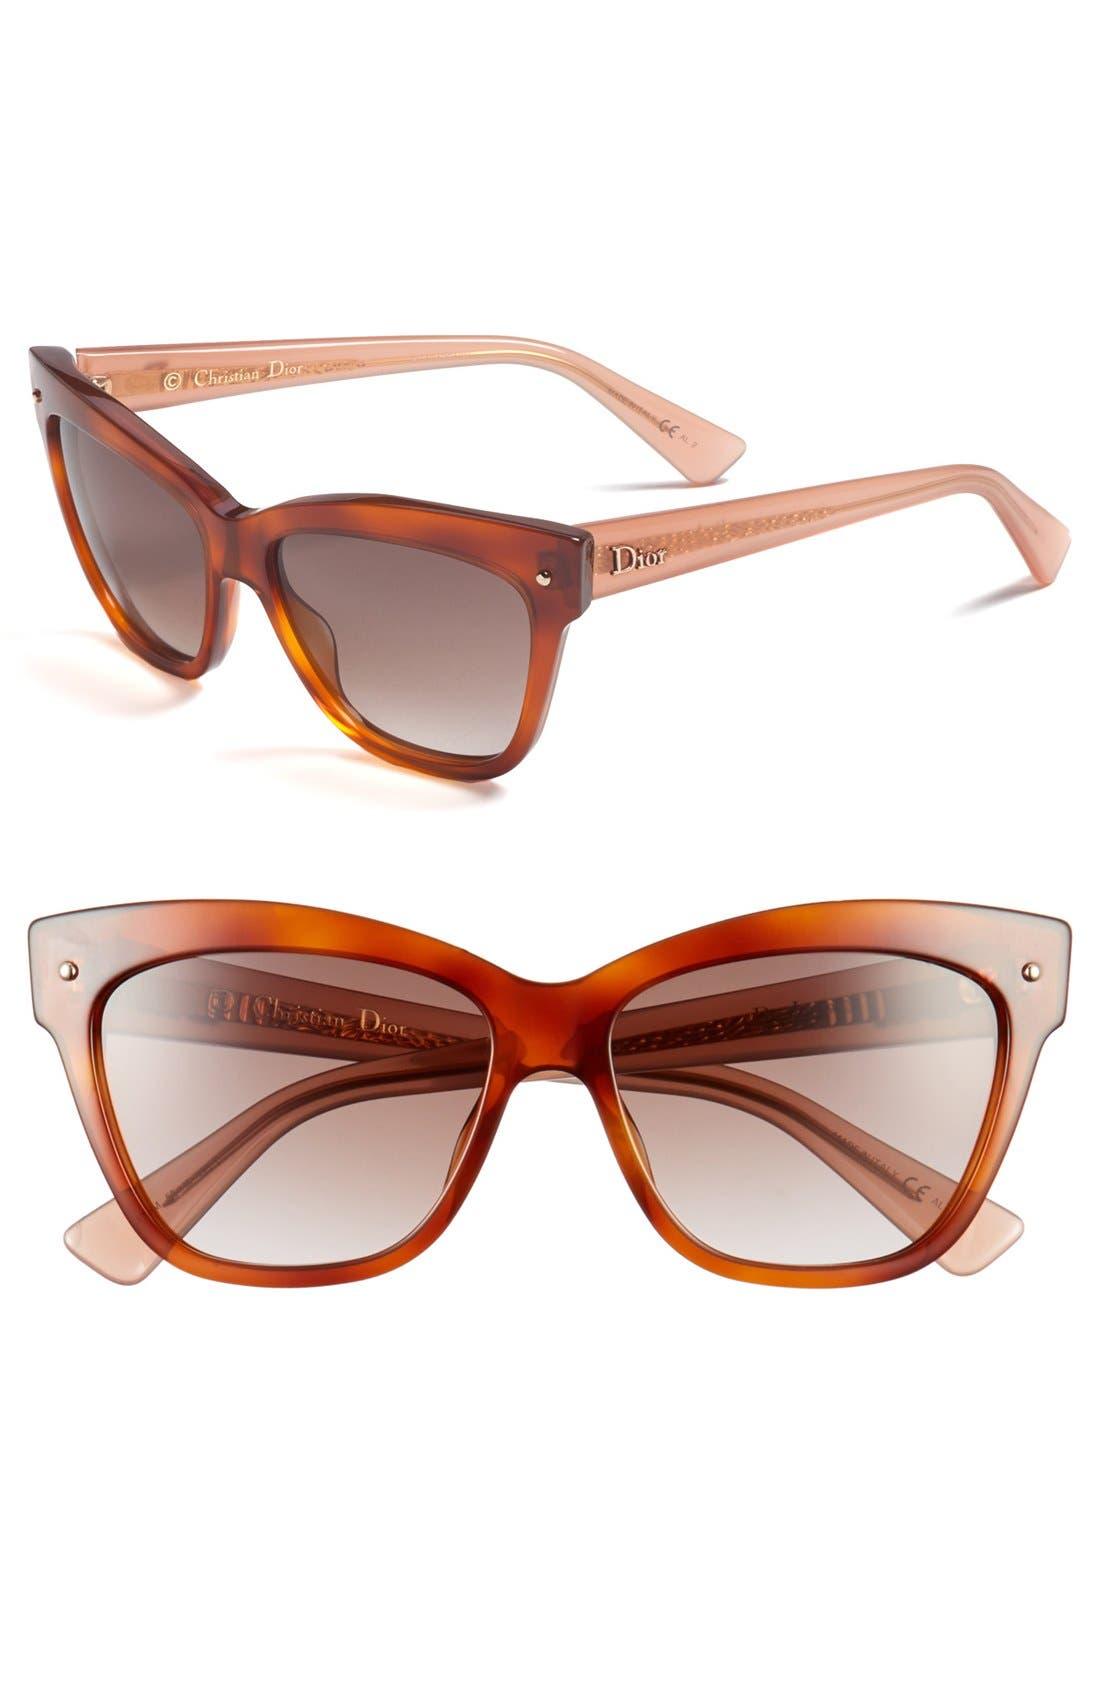 Main Image - Dior 'Jupon' 55mm Retro Sunglasses